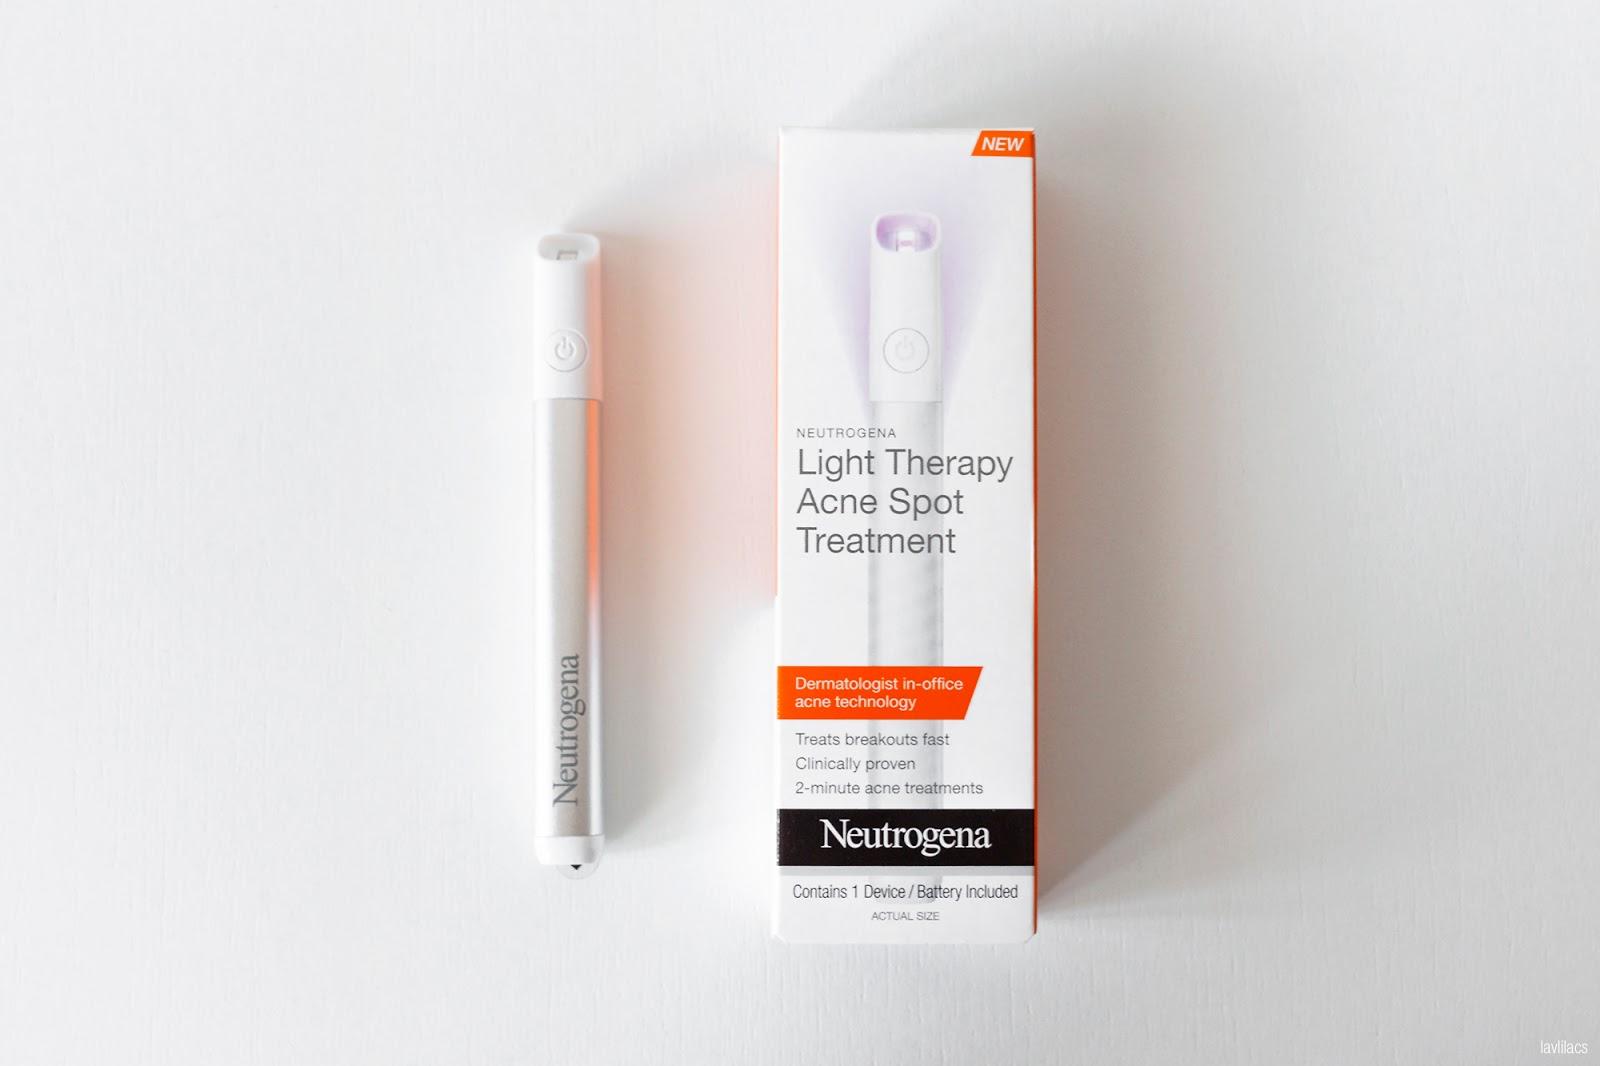 Neutrogena Light Therapy Acne Spot Treatment Lavenderlilac Dream